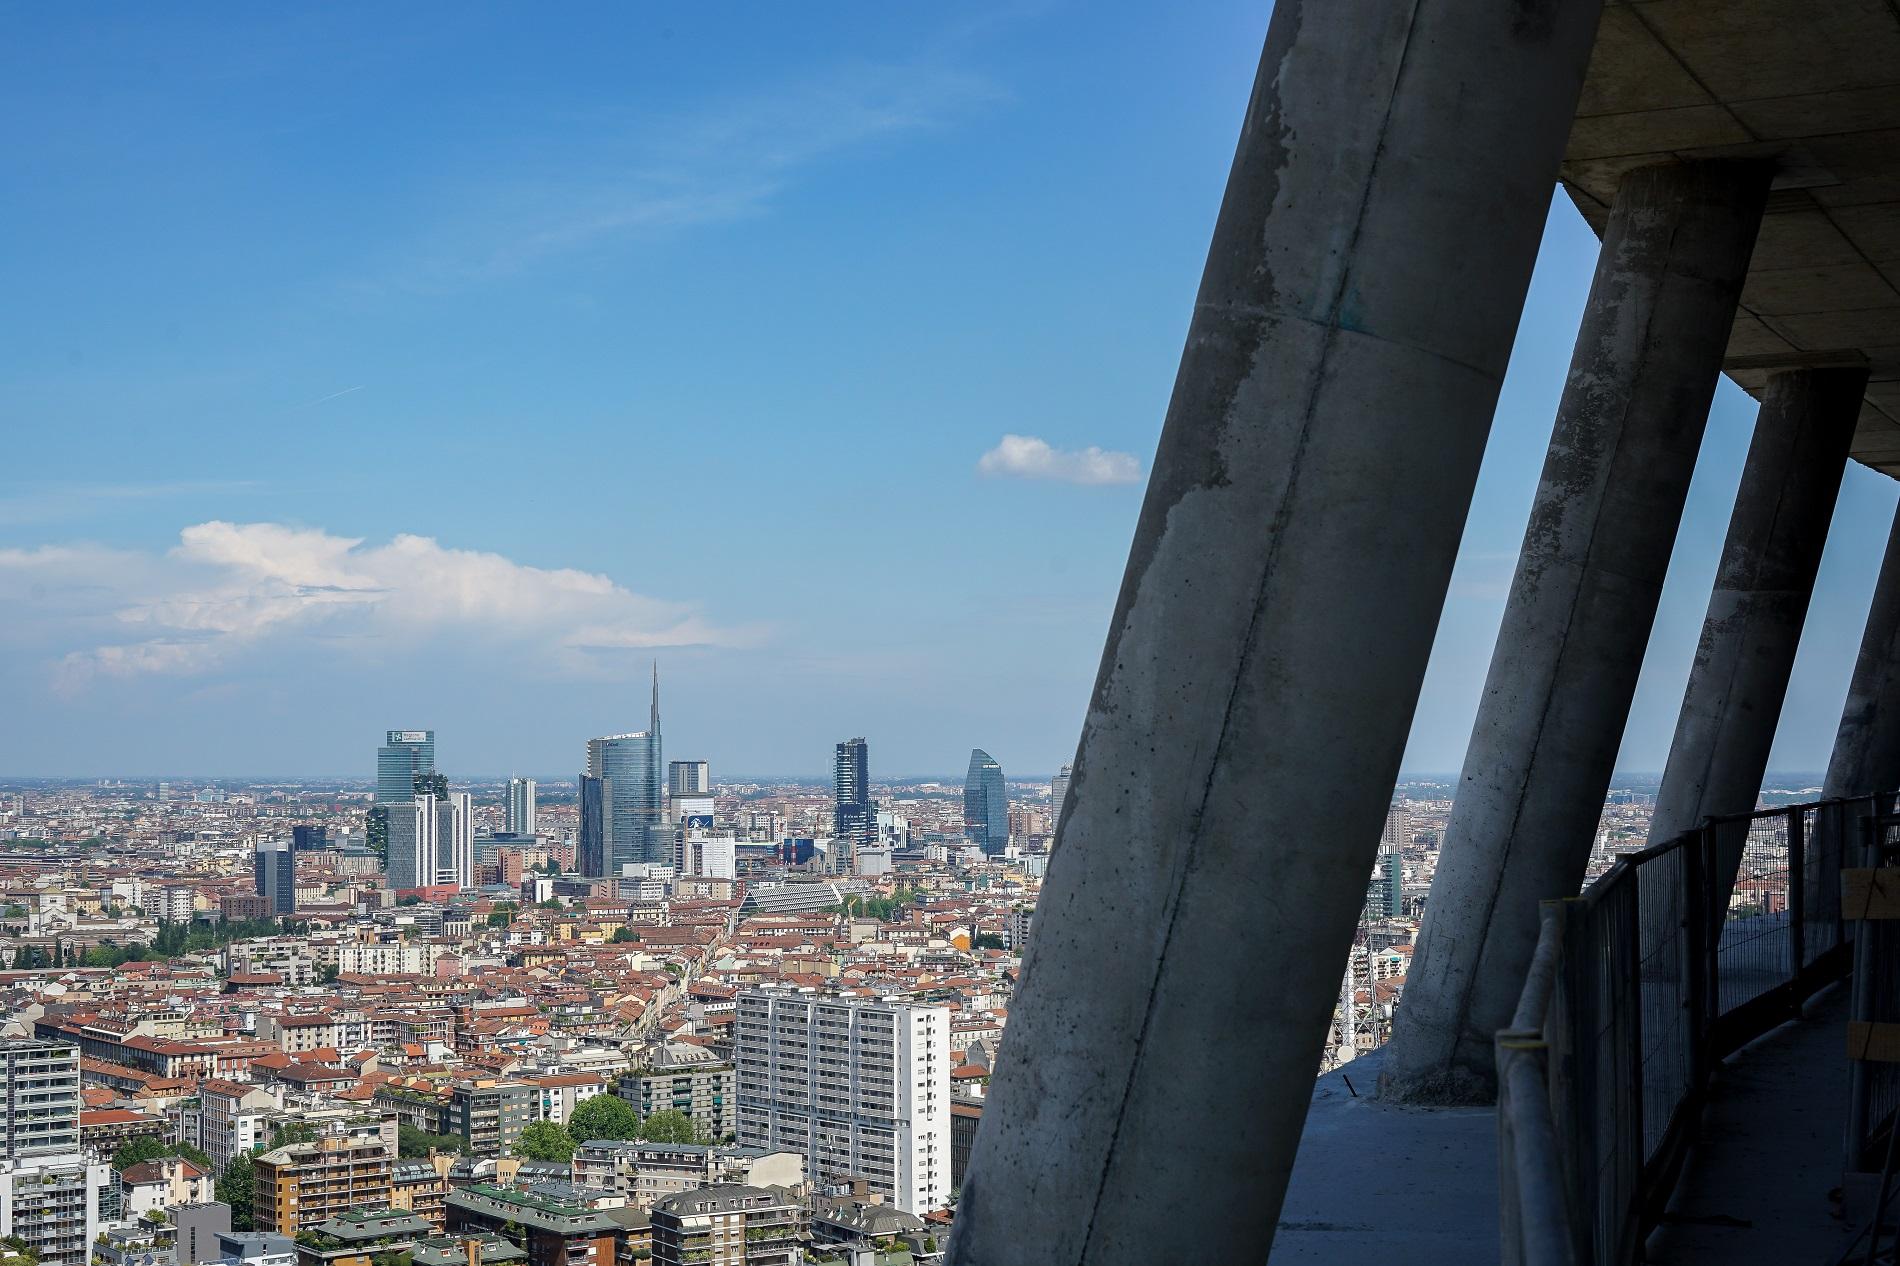 citylife, milano, cantiere pwc, torre libeskind, architettura milanese, grattacieli milanesi, skyline milano